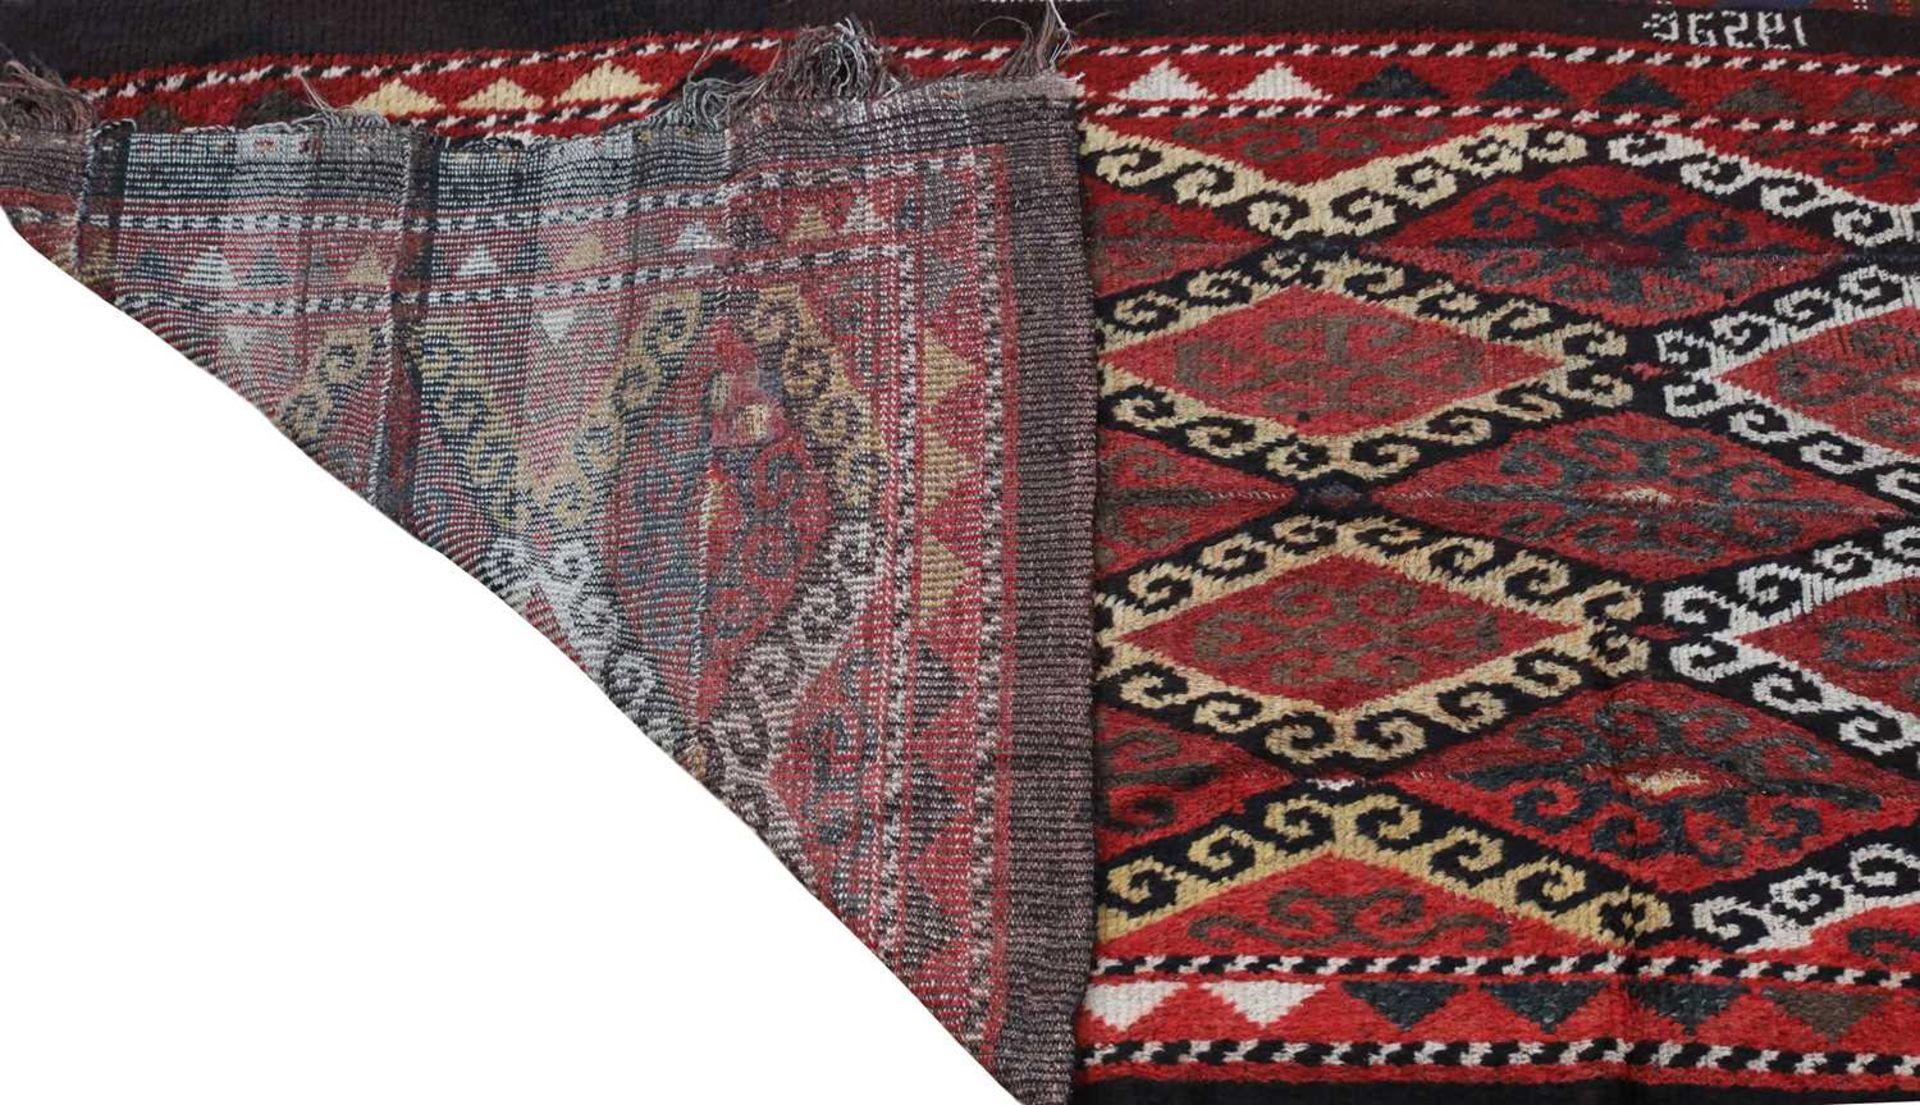 A yak wool rug, - Image 2 of 3